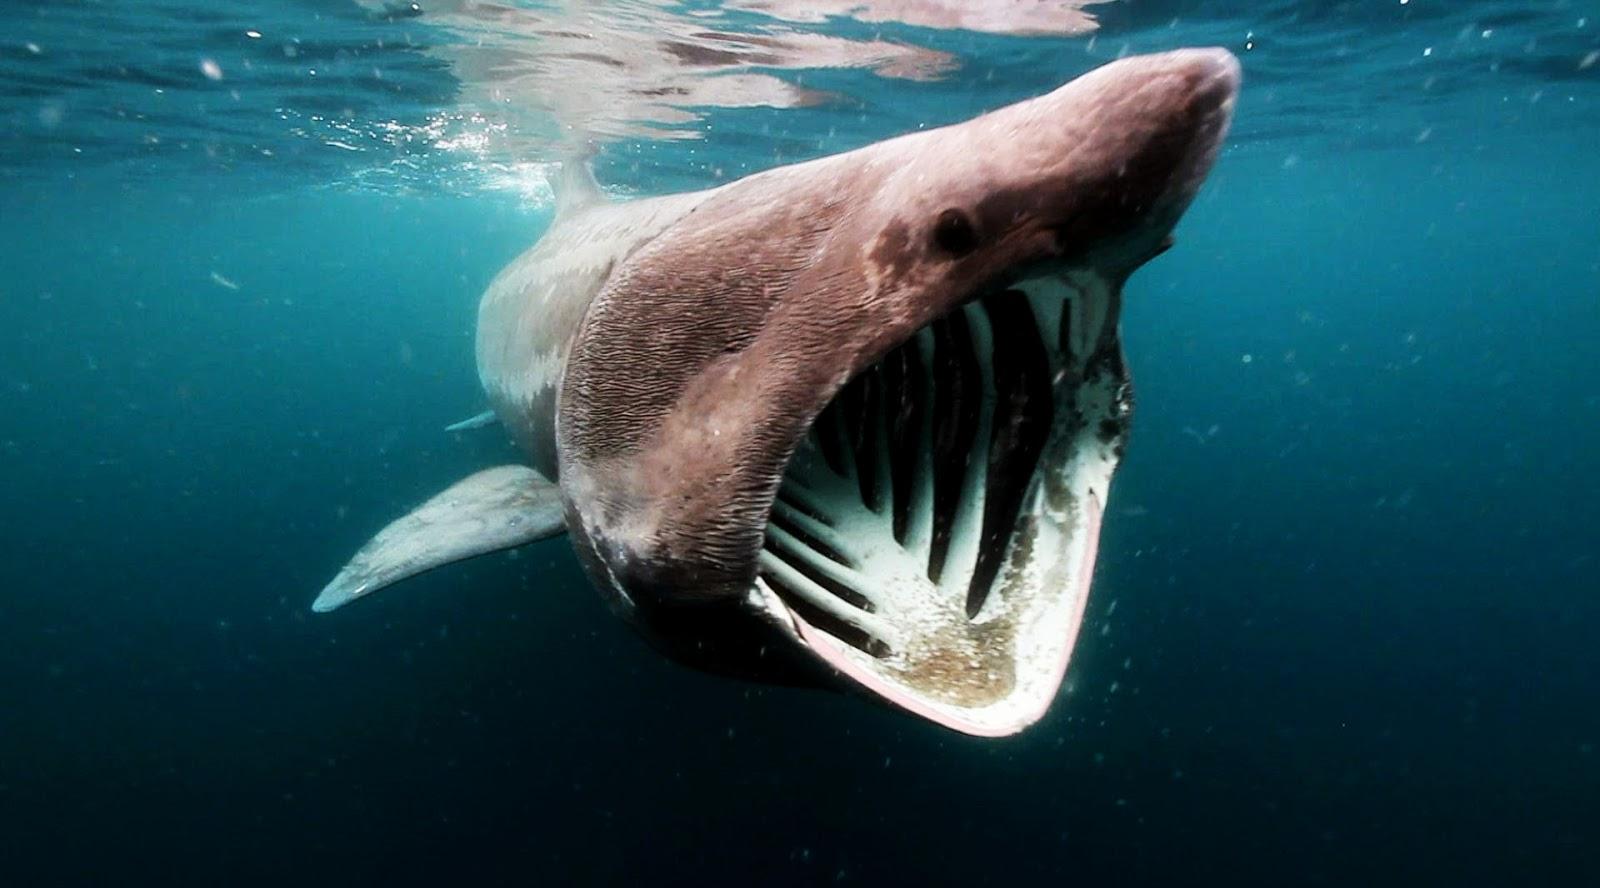 hiu pulau weh kepala besar